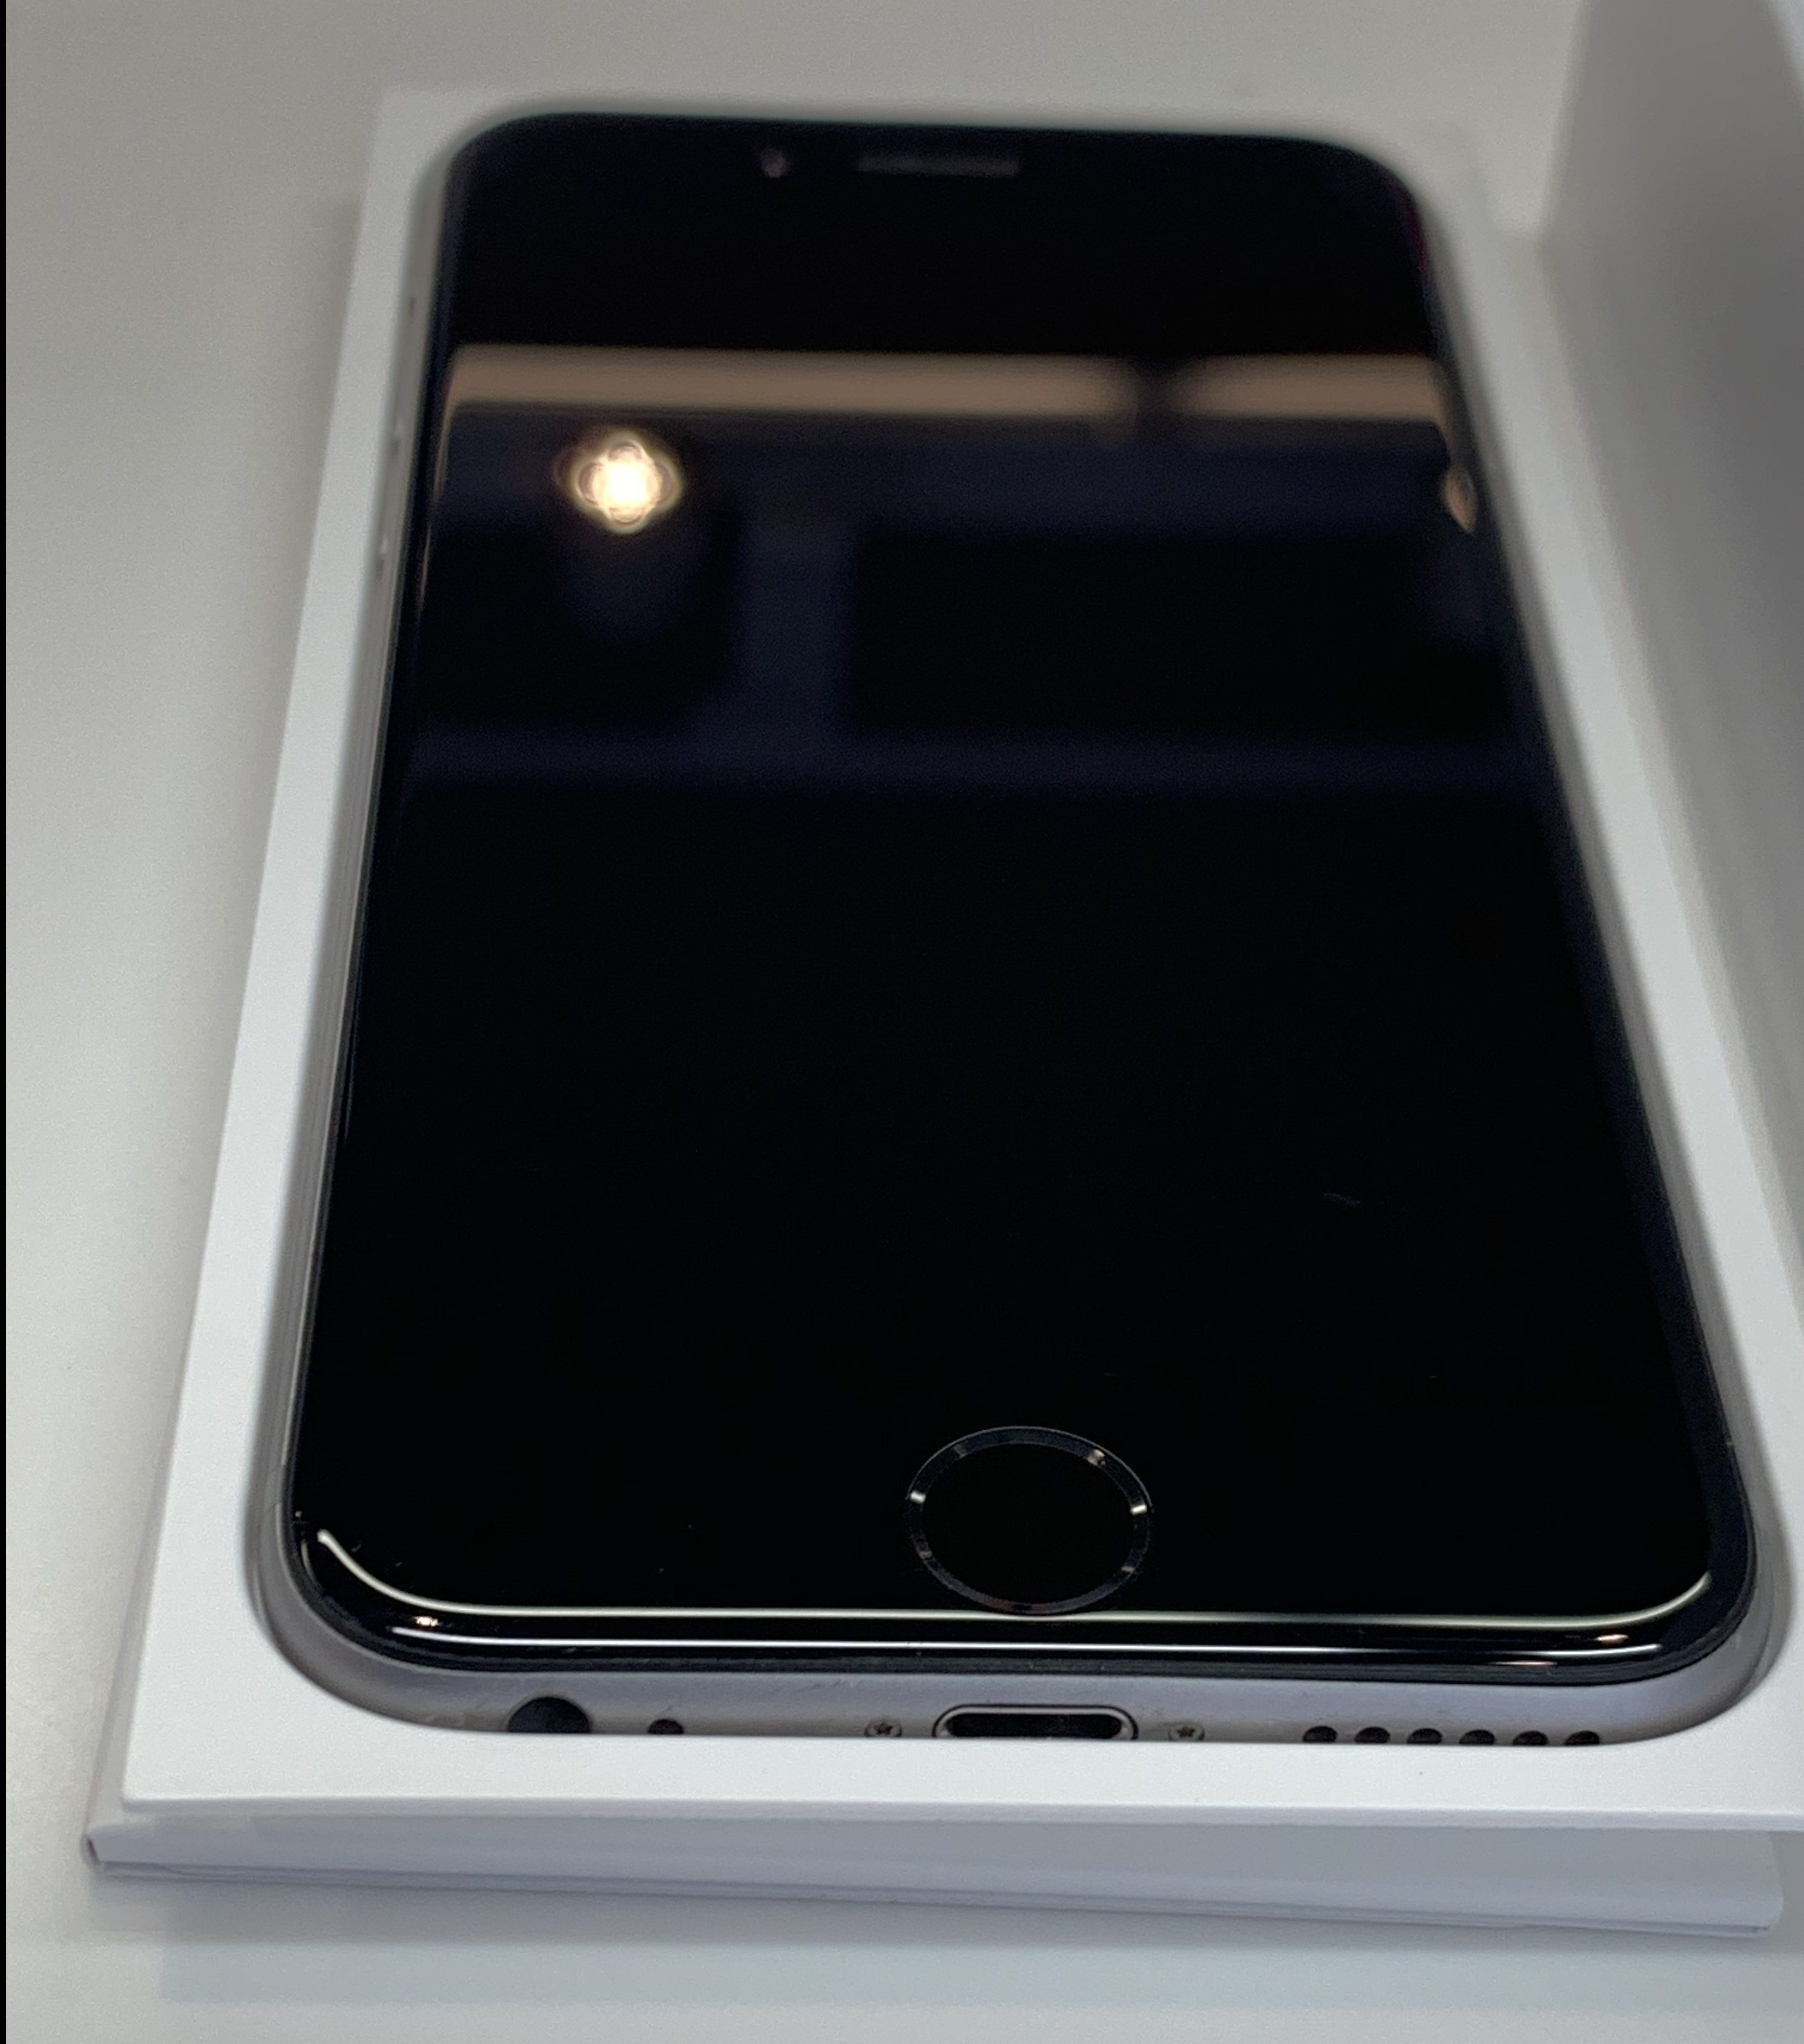 iPhone 6 32GB, 32 GB, Space Gray, obraz 4